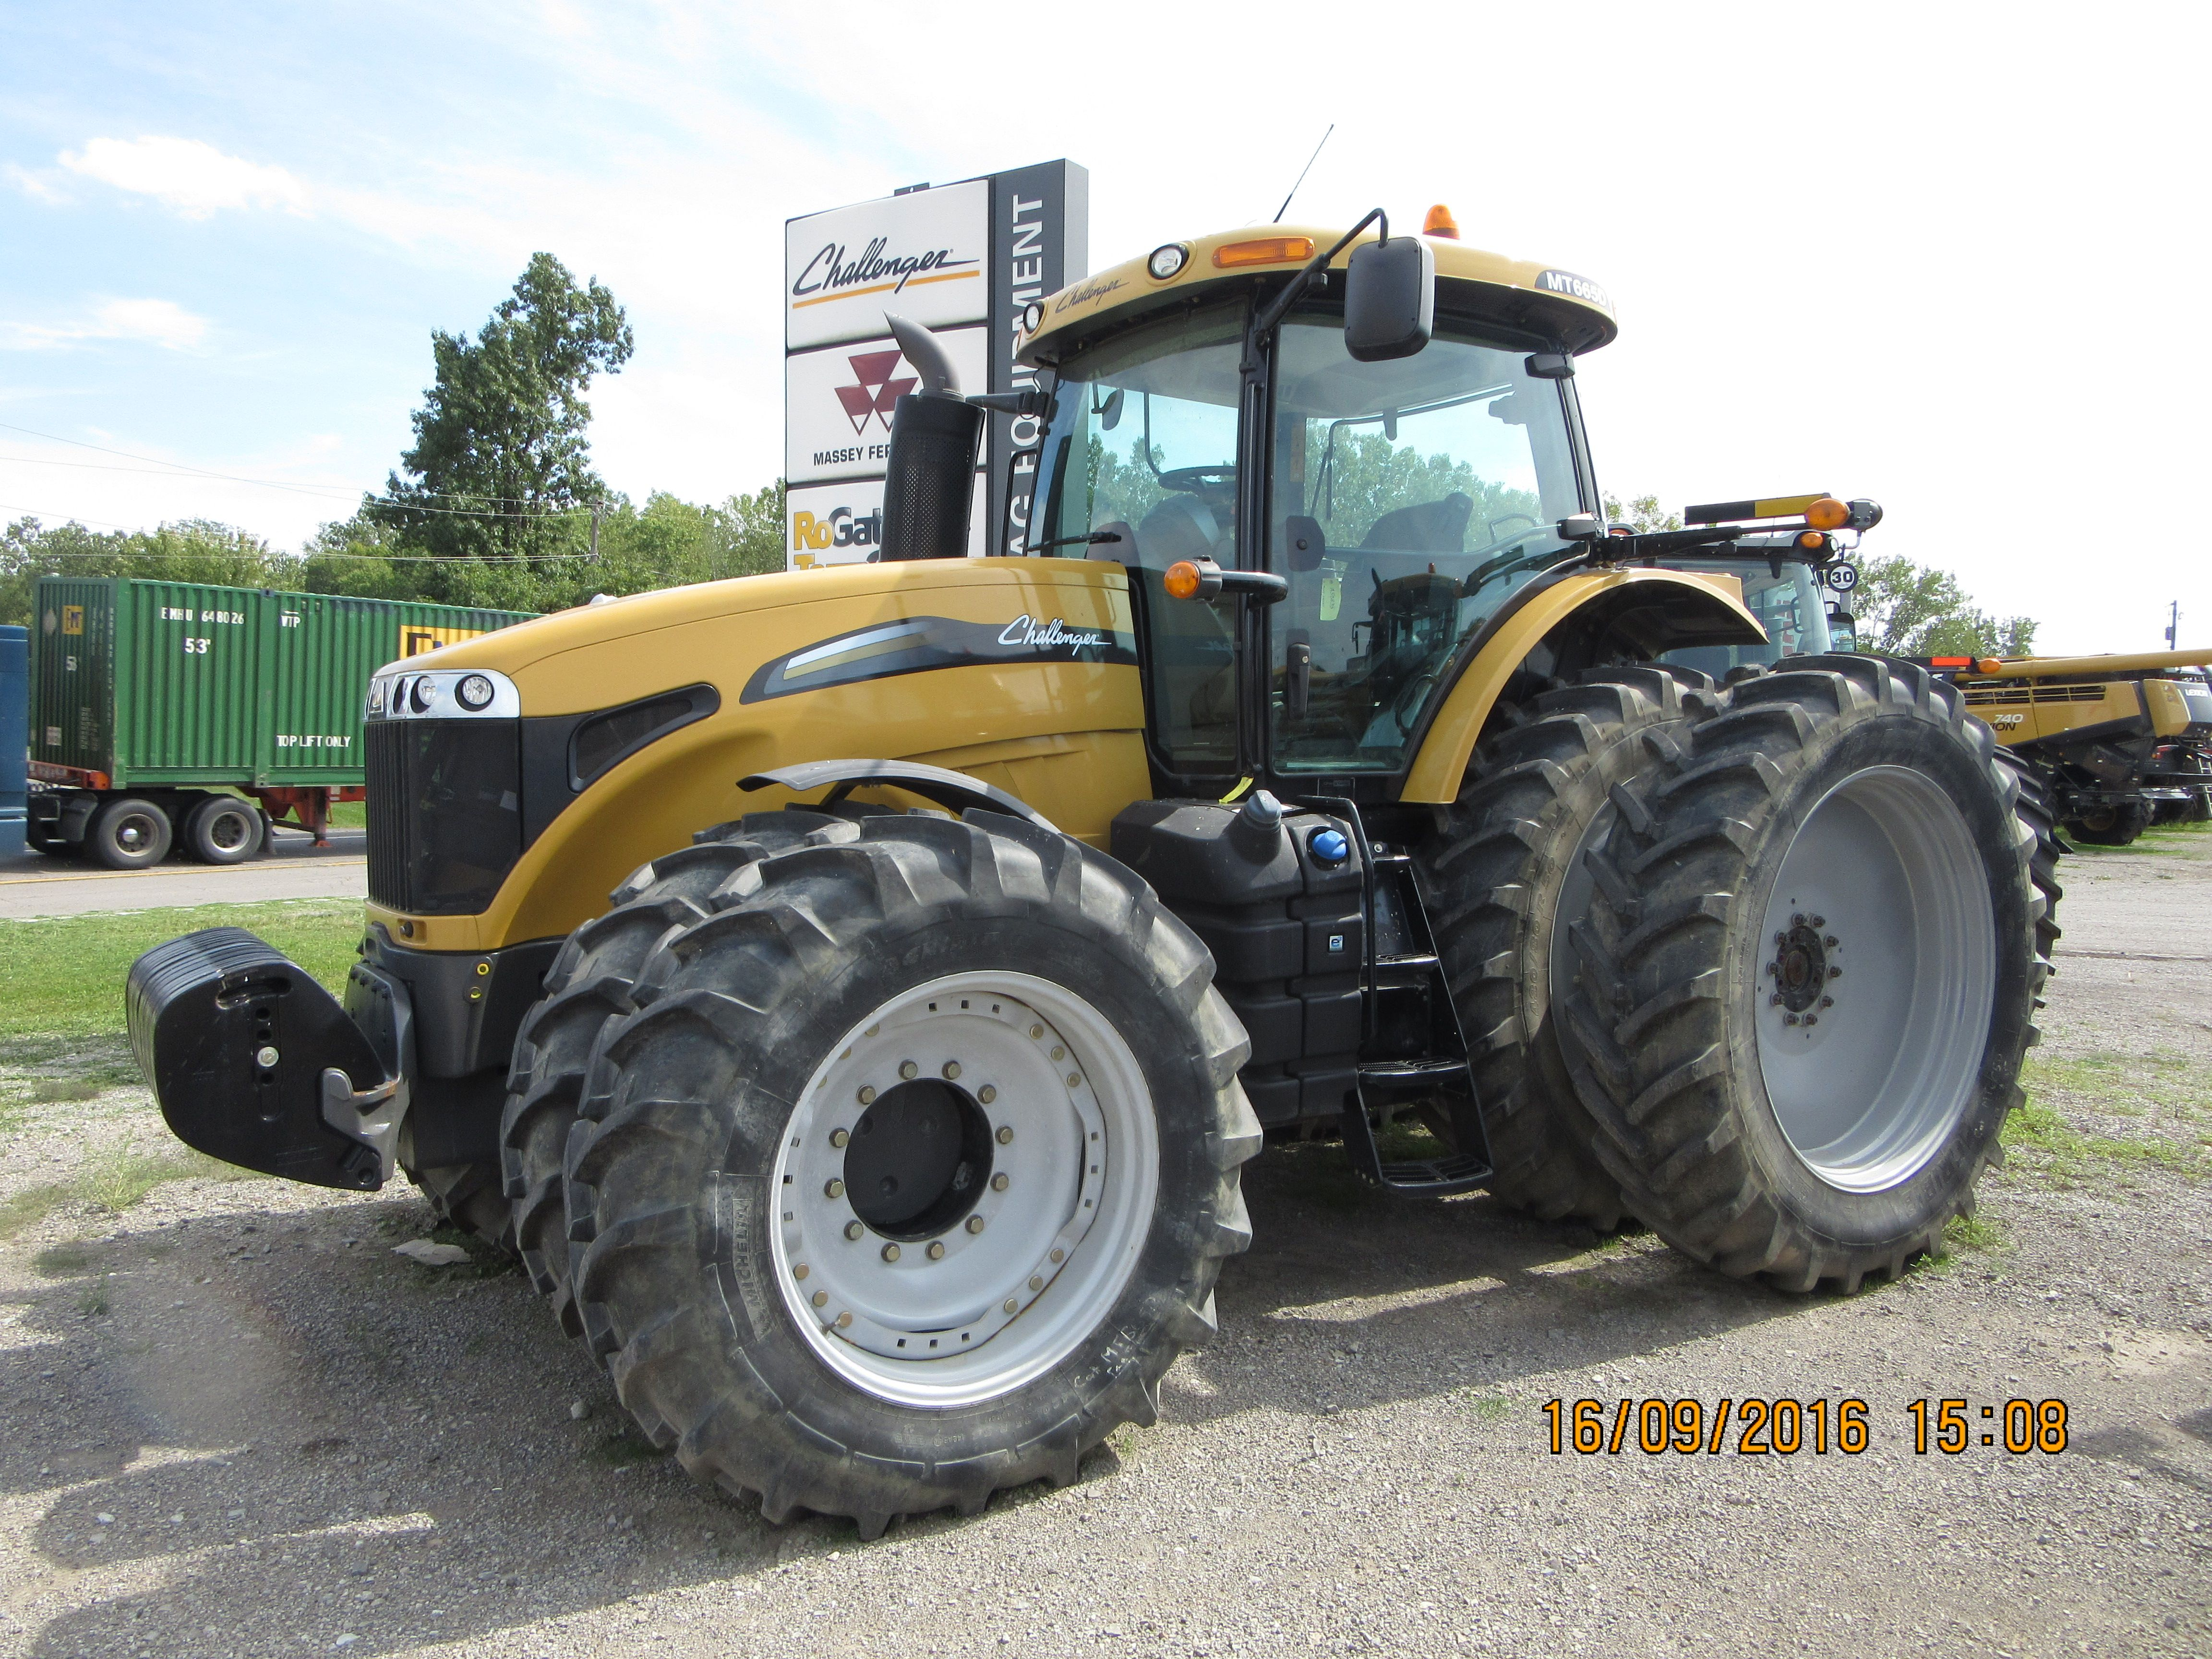 Challenger MT665D (With images) Tractors, Challenger